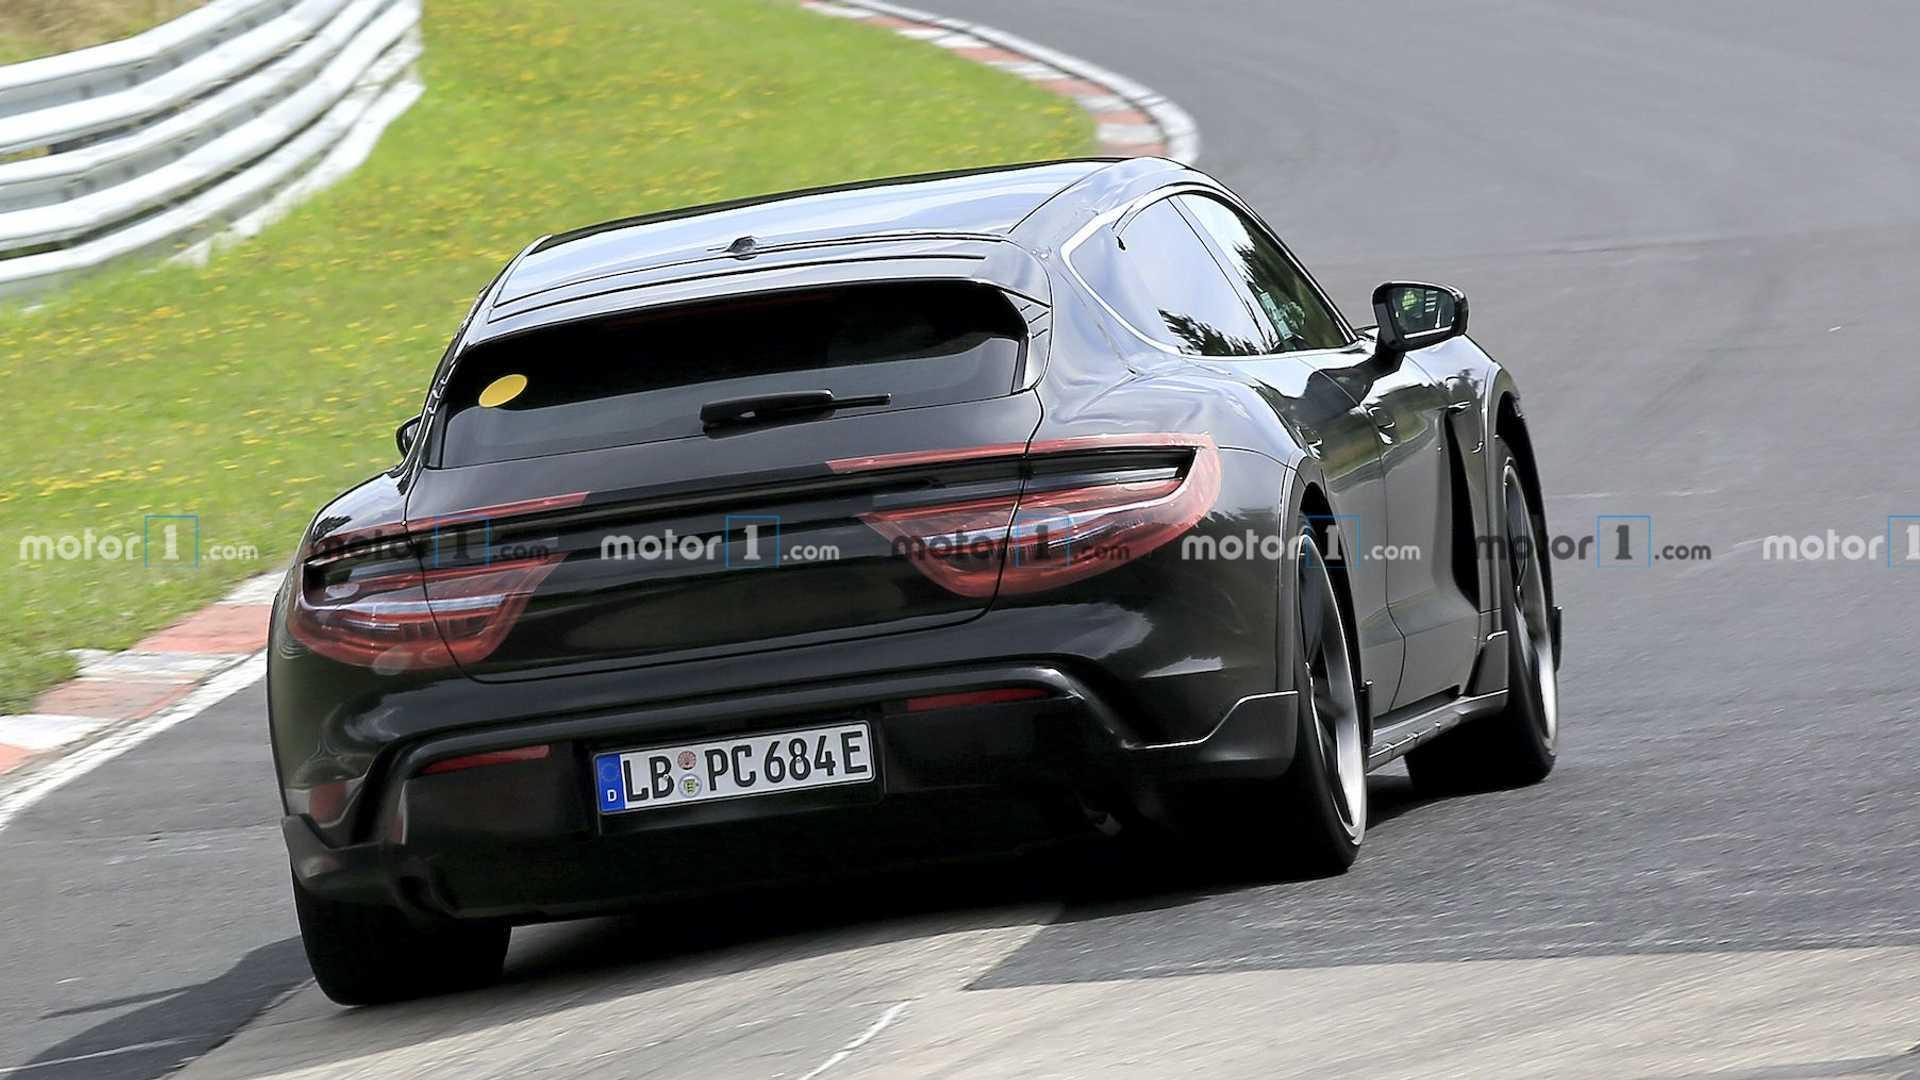 2020 - [Porsche] Taycan Sport Turismo - Page 2 Porsche-taycan-cross-turismo-spied-at-nurburgring-rear